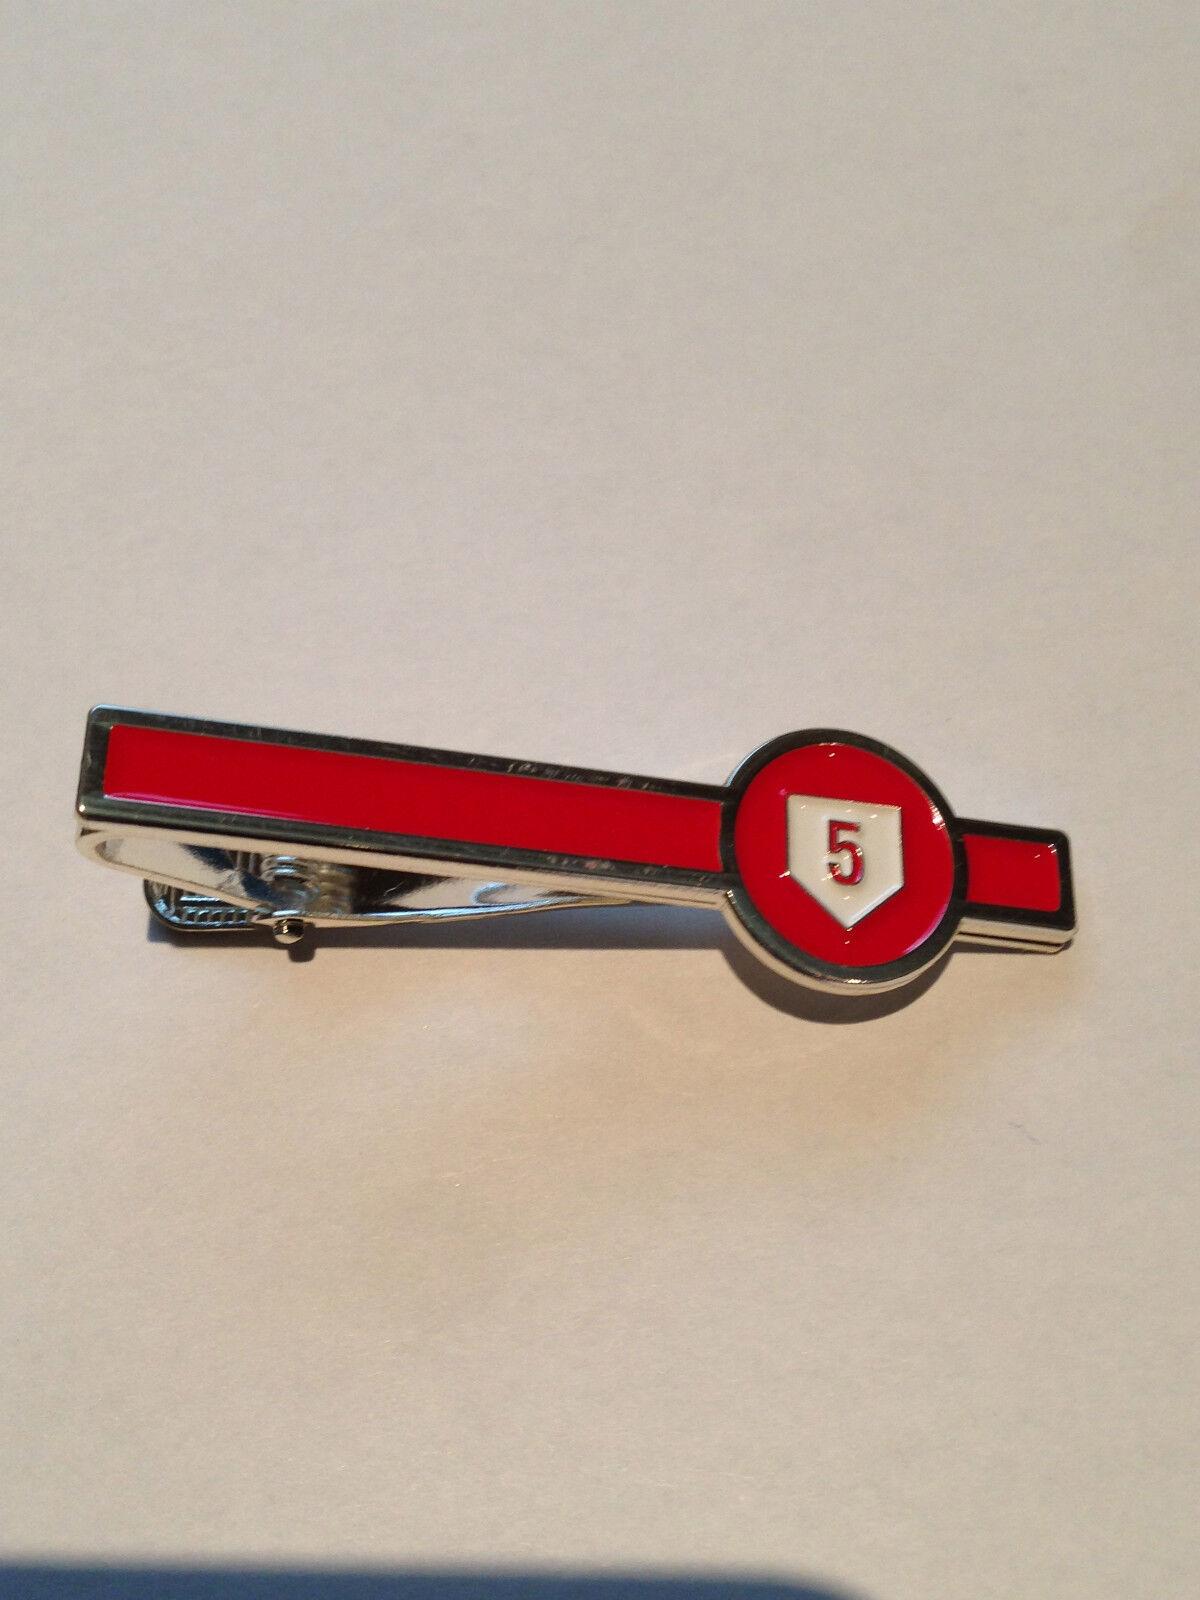 Cincinnati rots Johnny Bench Krawatte Verschluss  1 1 1 Best Seller-Great Gift Ware 65a7c4